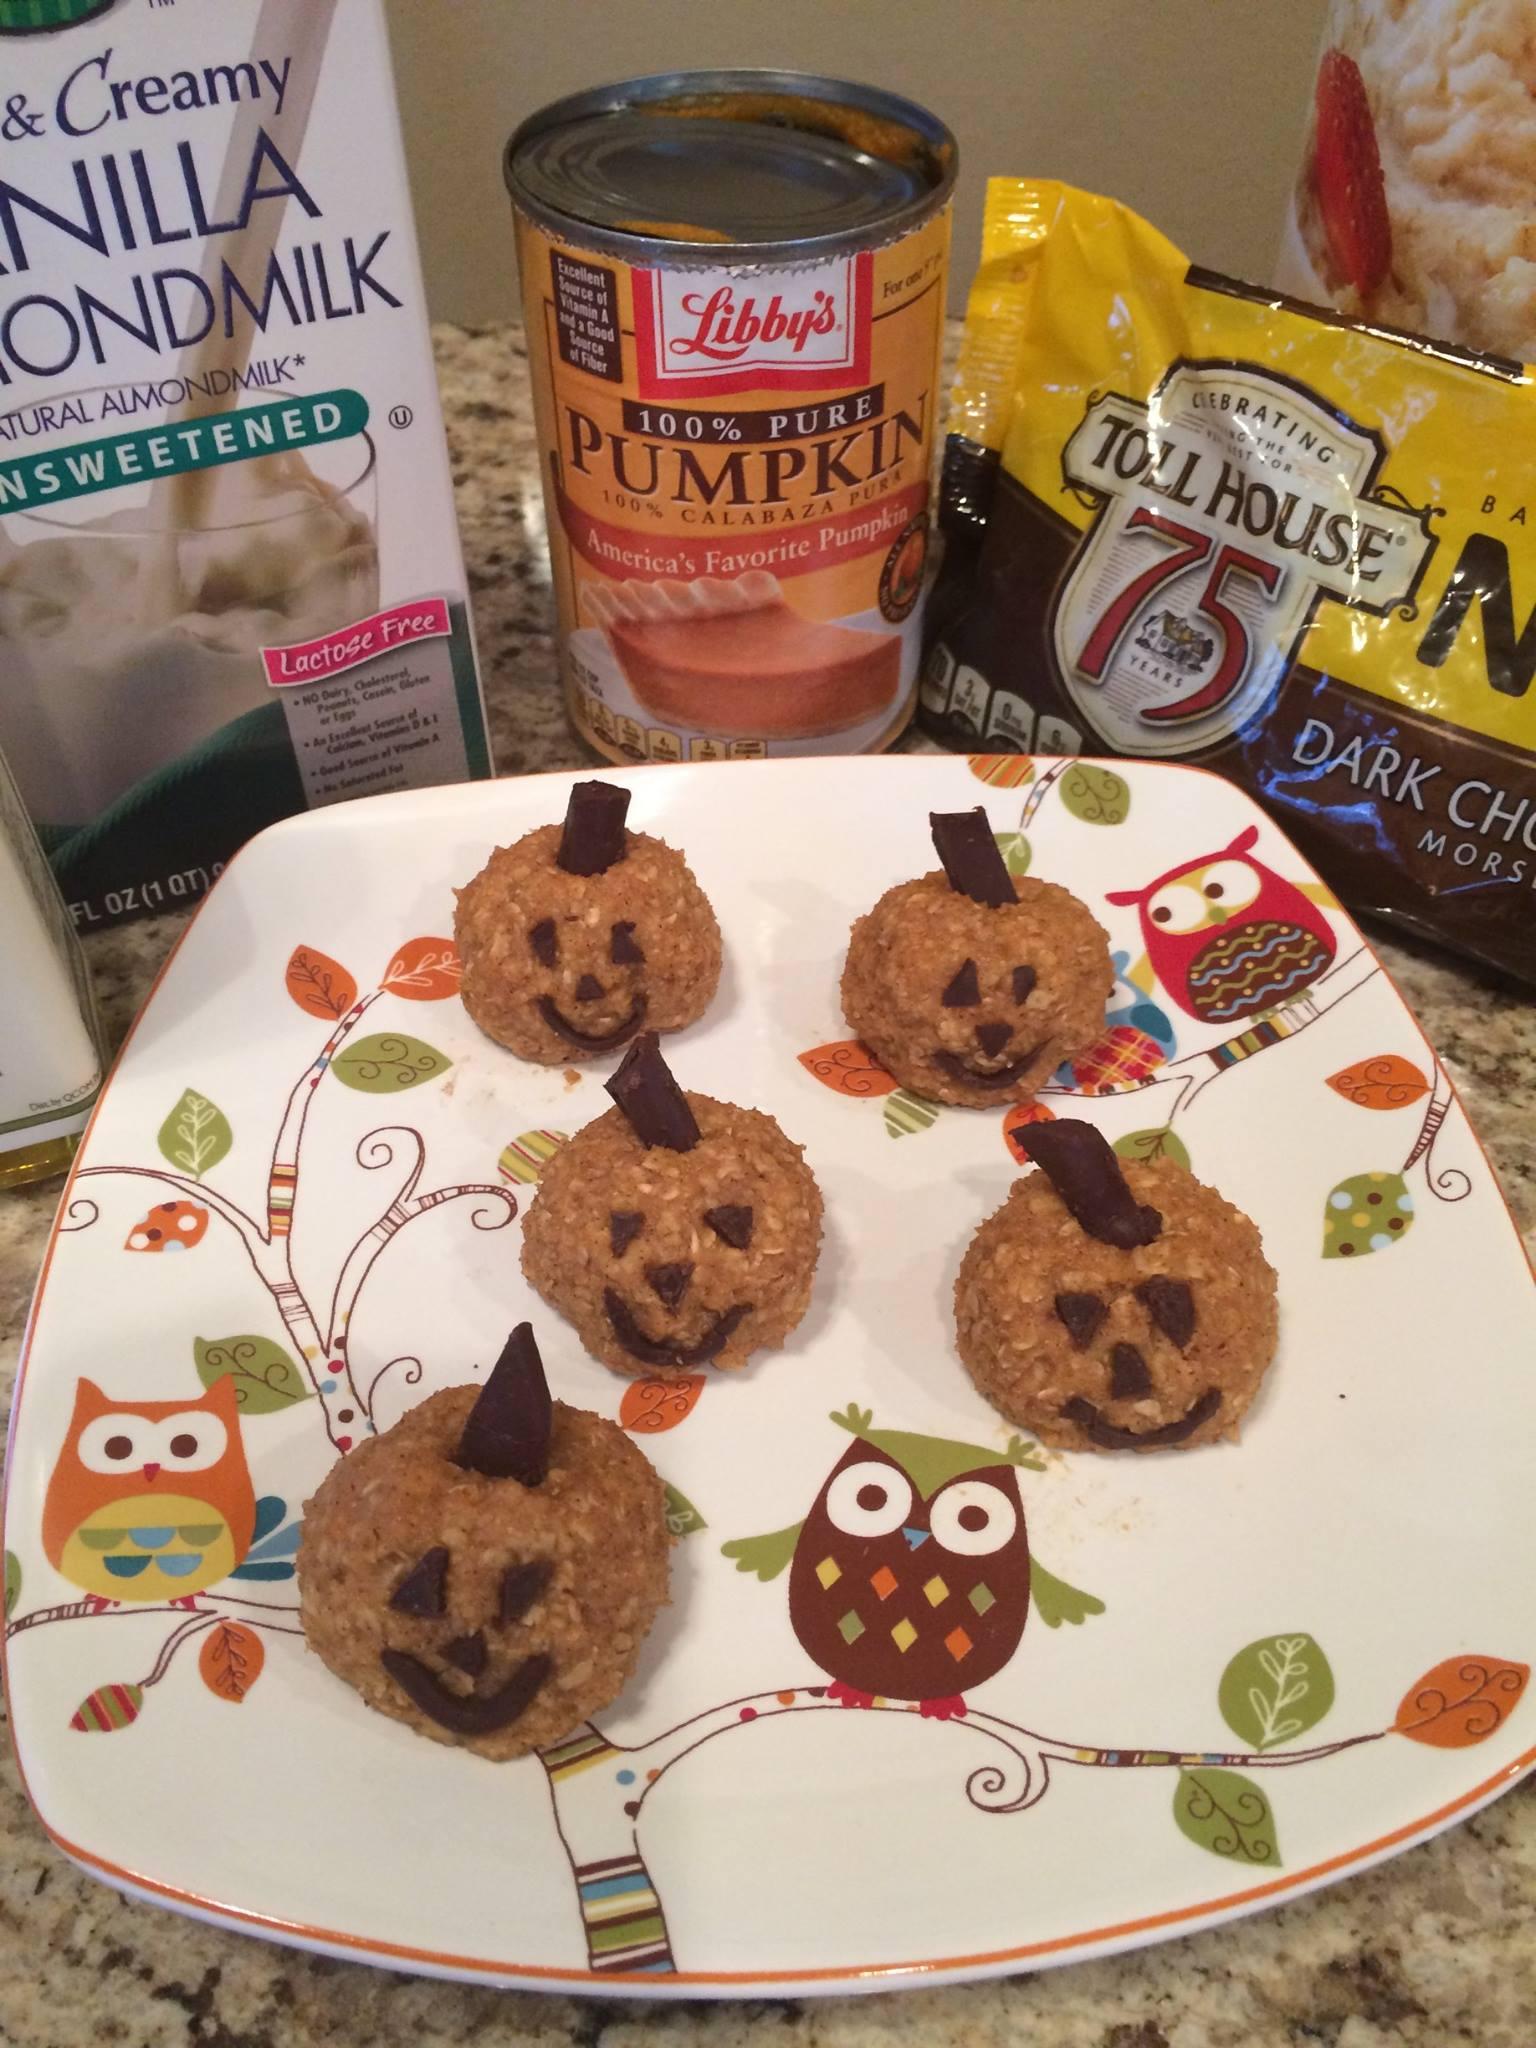 No-bake pumpkin cookies are good as well. (Source: 3TV/CBS 5)